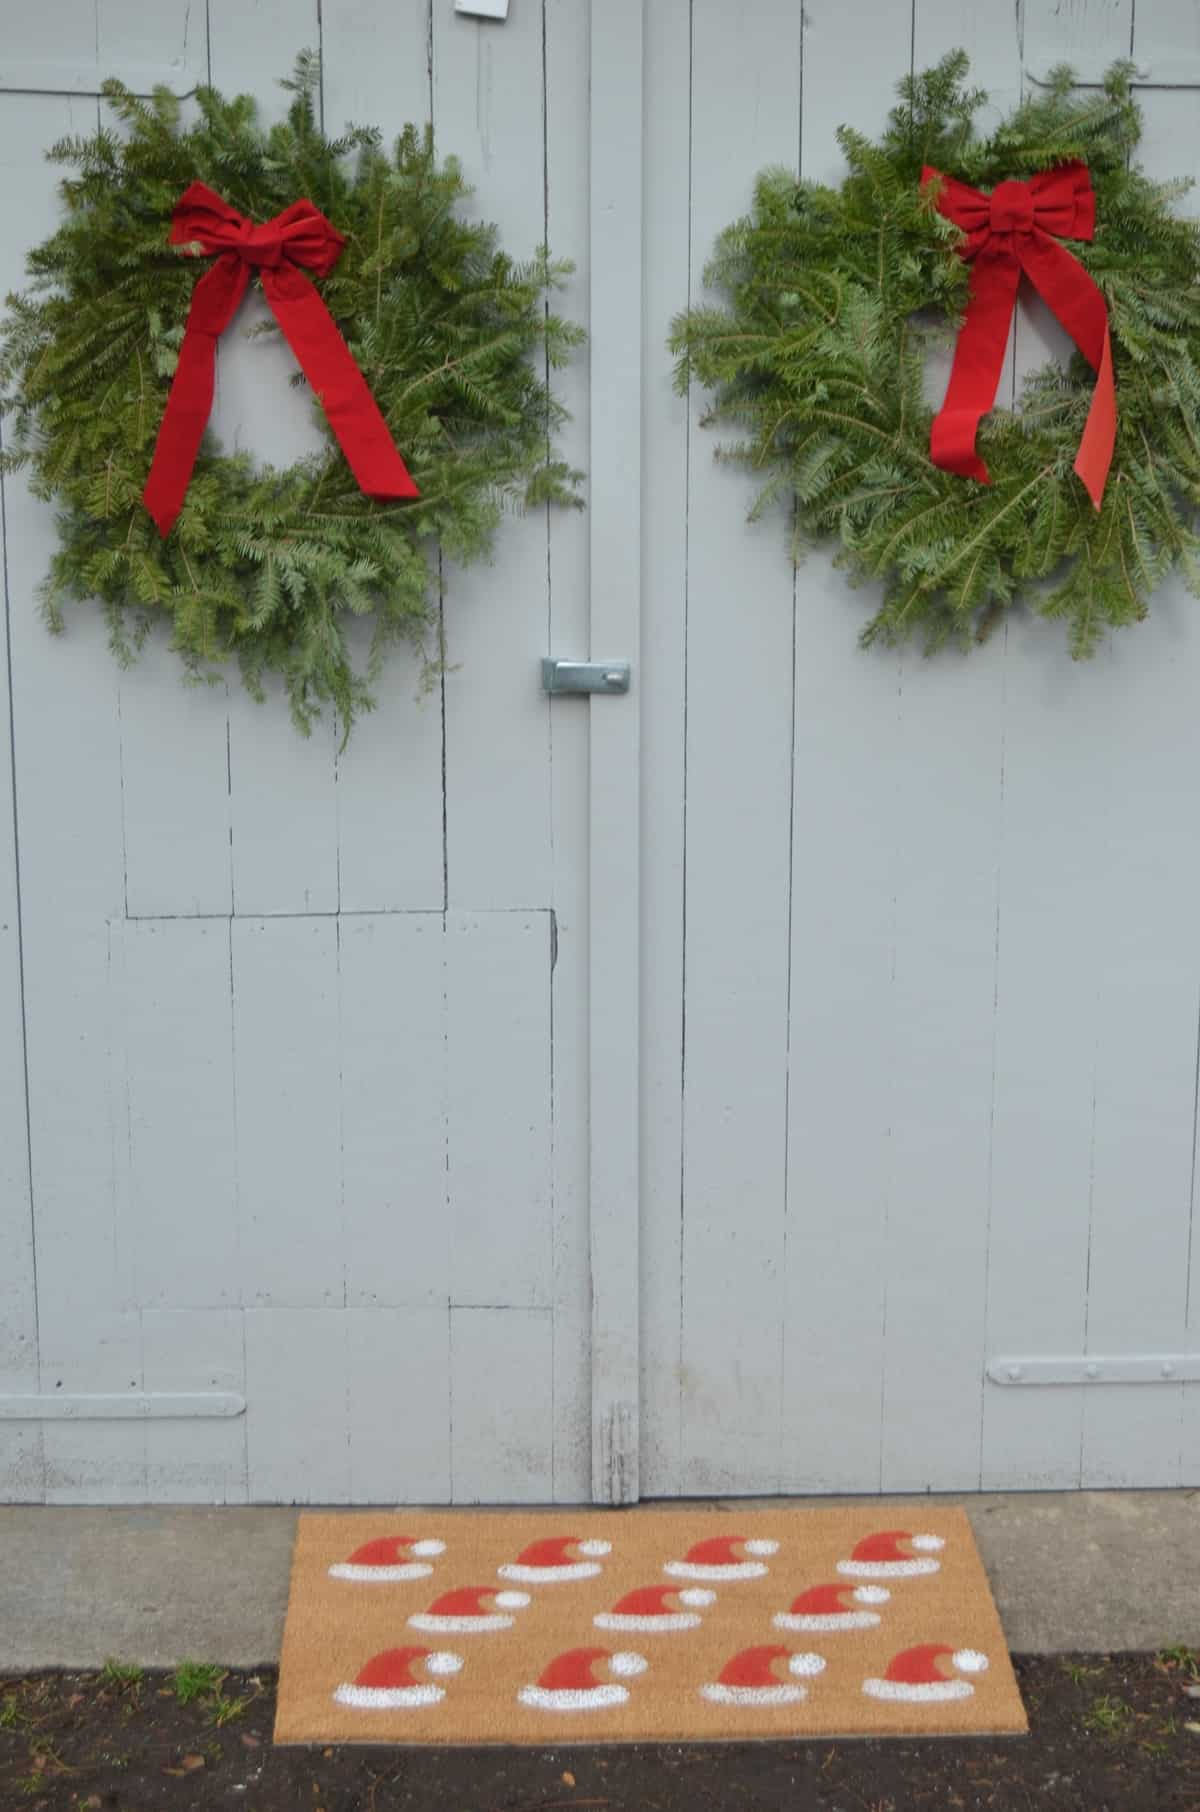 Stenciled santa clause door mat.